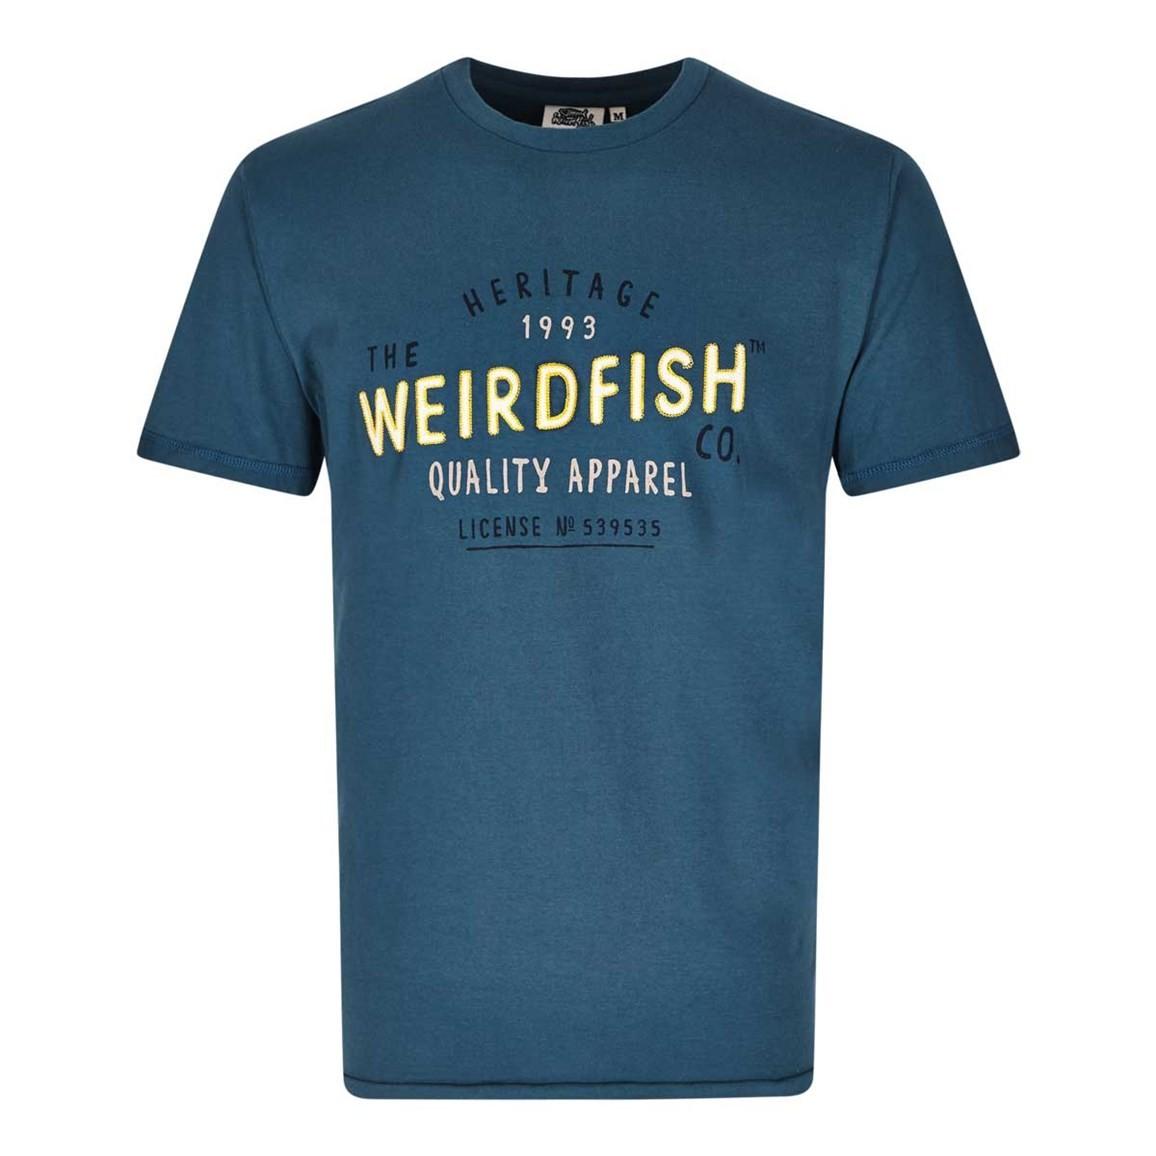 Image of Weird Fish Heritage Applique & Graphic Print Cotton T-Shirt Dark Blue Size XS